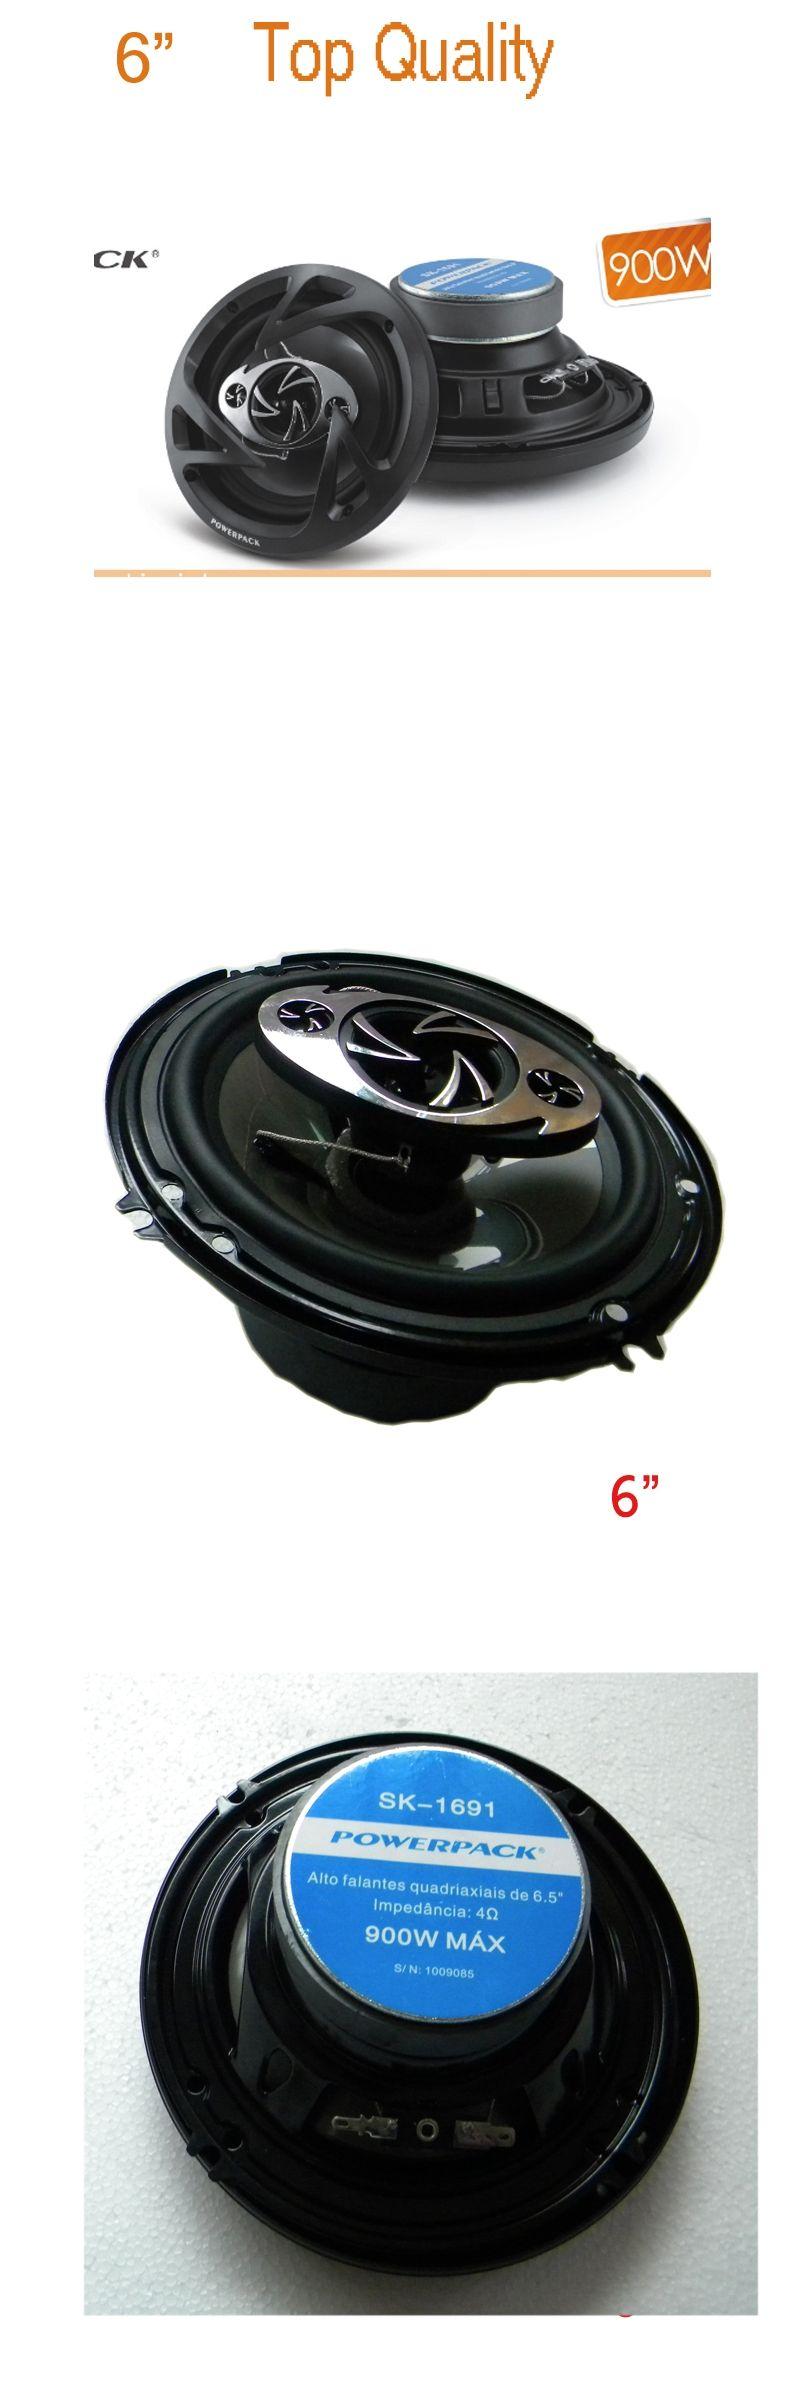 6 Coaxial Car Speaker New Arrival Car Audio Acoustic Speakers Hi